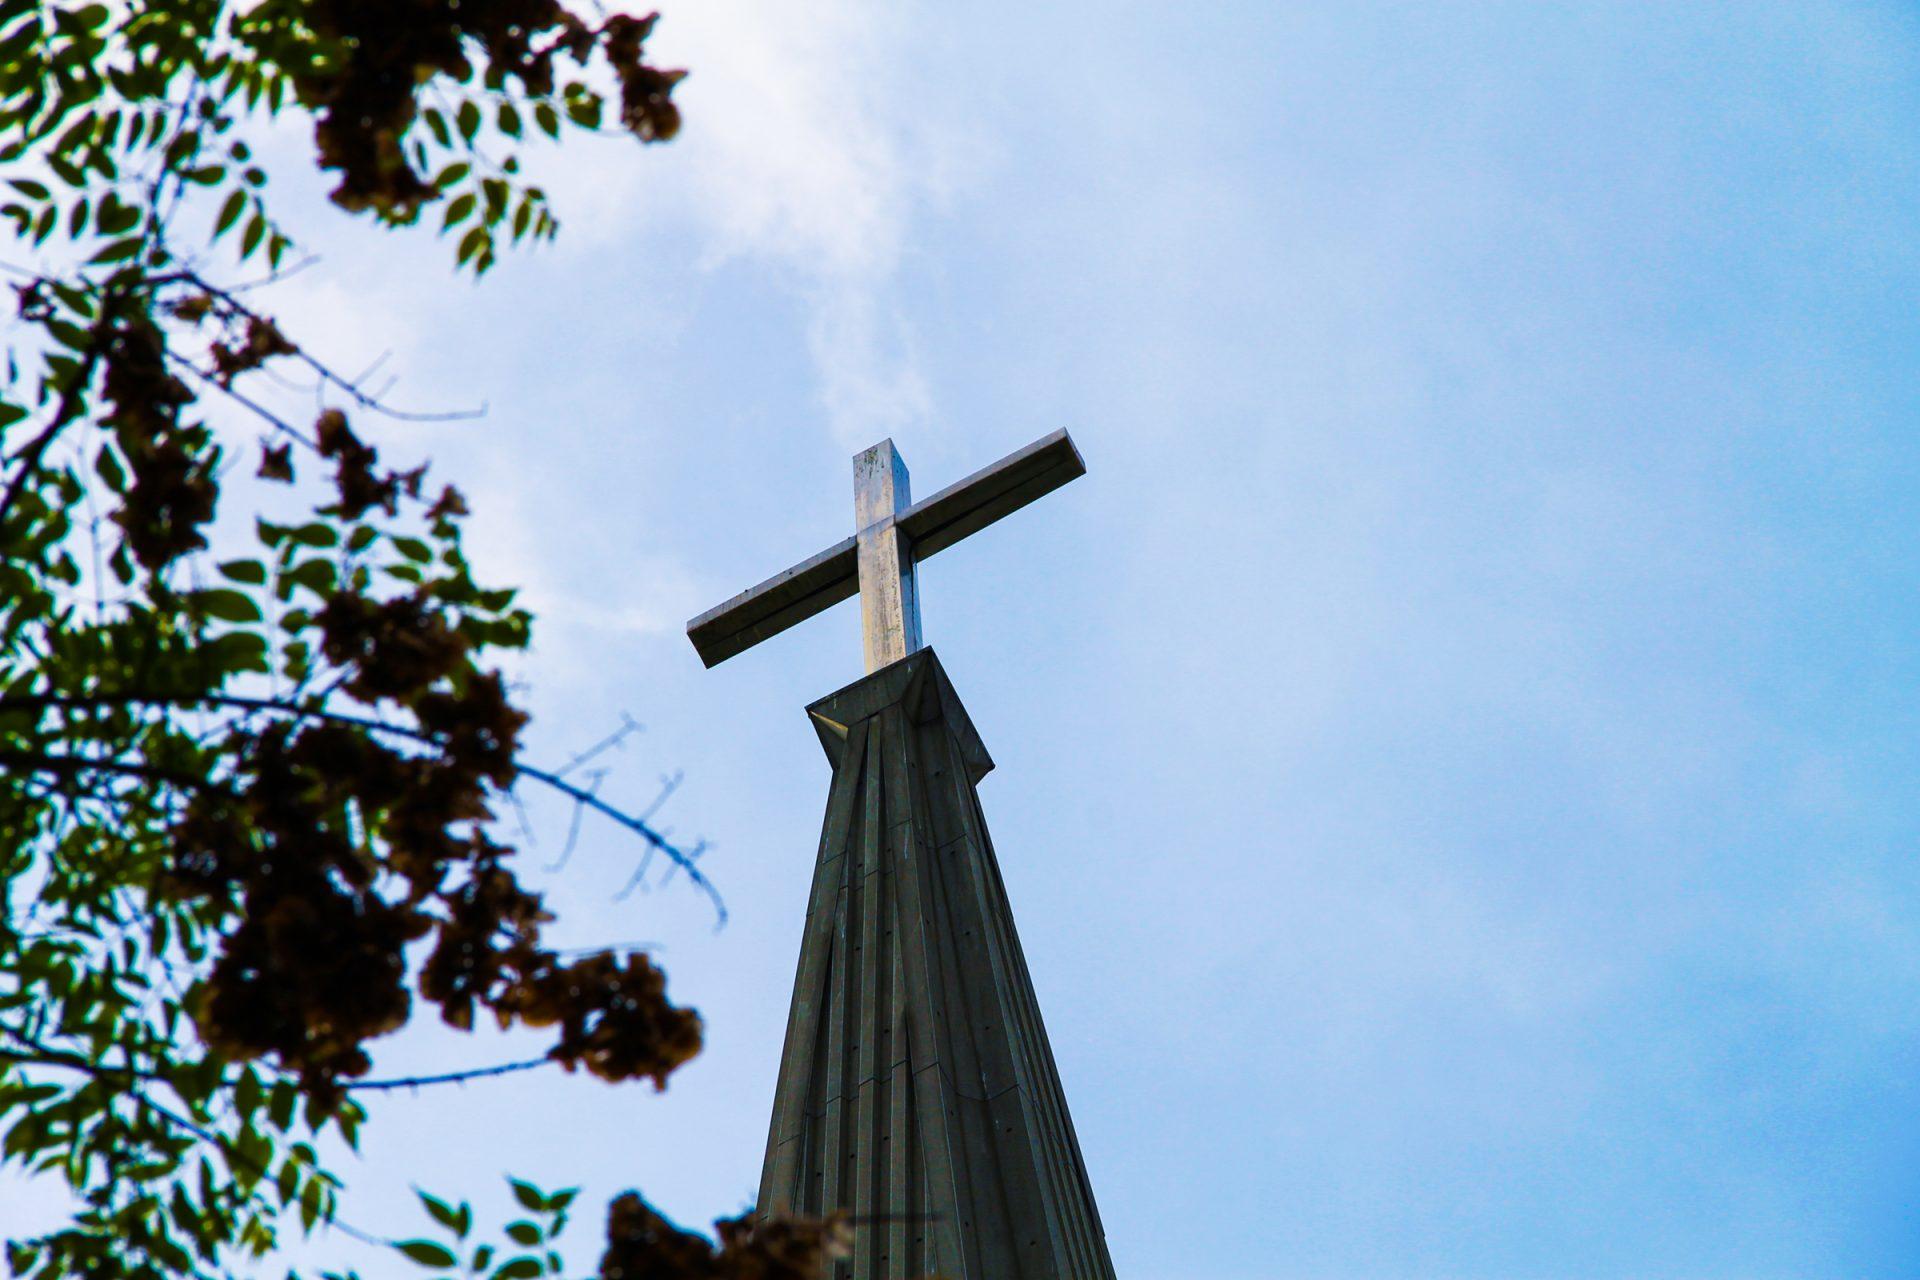 Cross on Church Steeple on Blue Sky